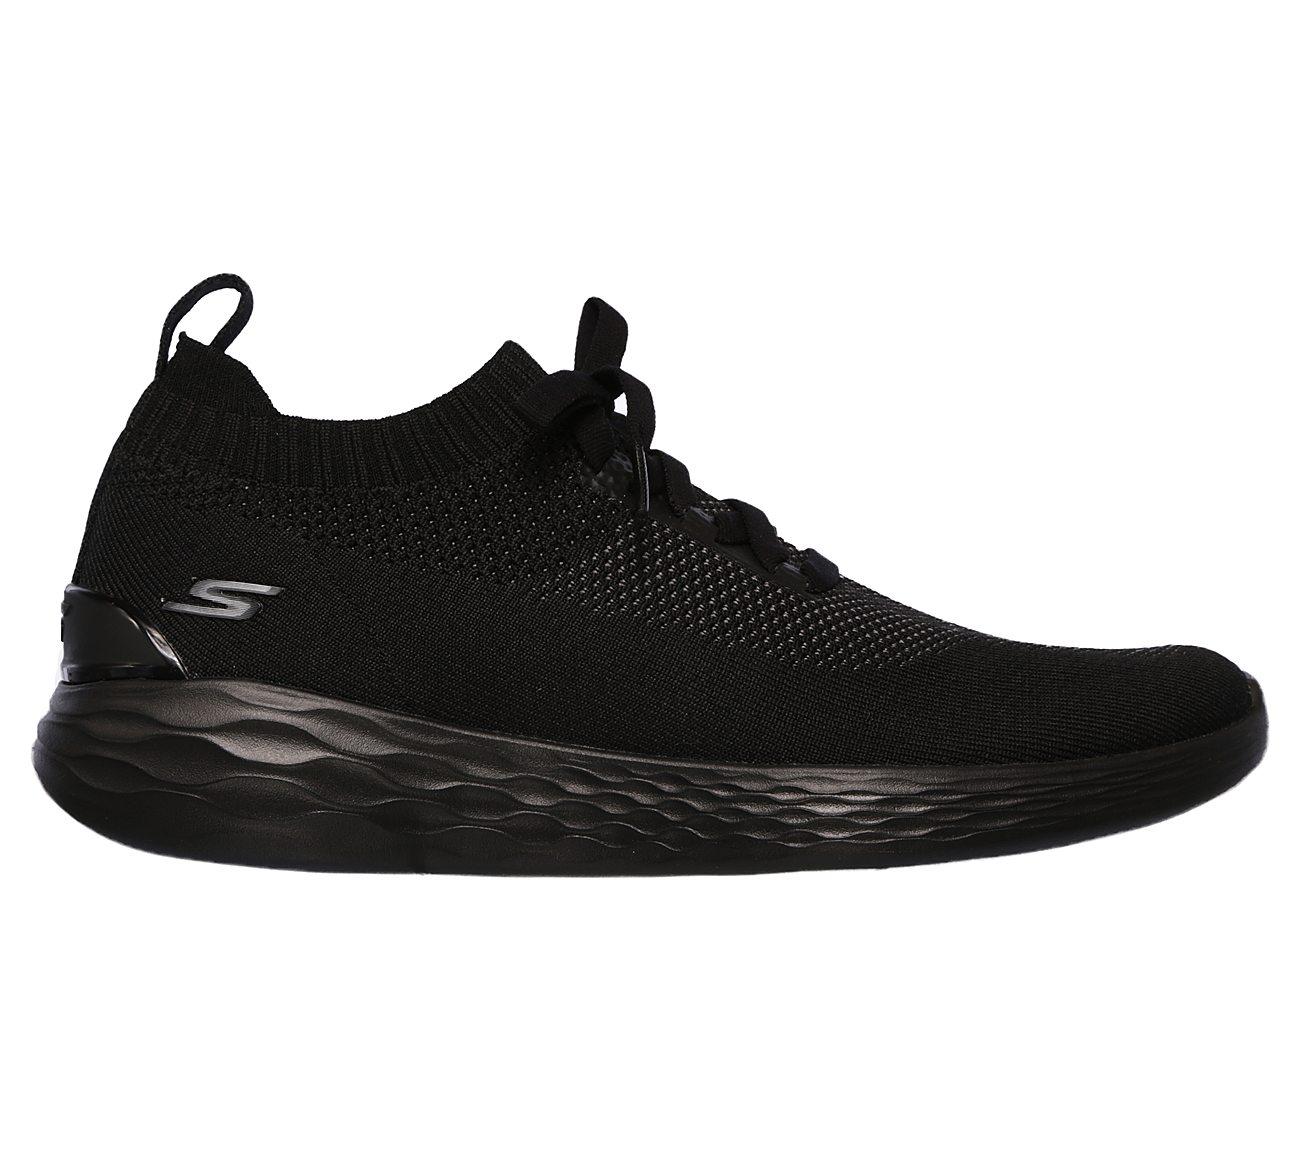 Altitude Skechers Performance Shoes